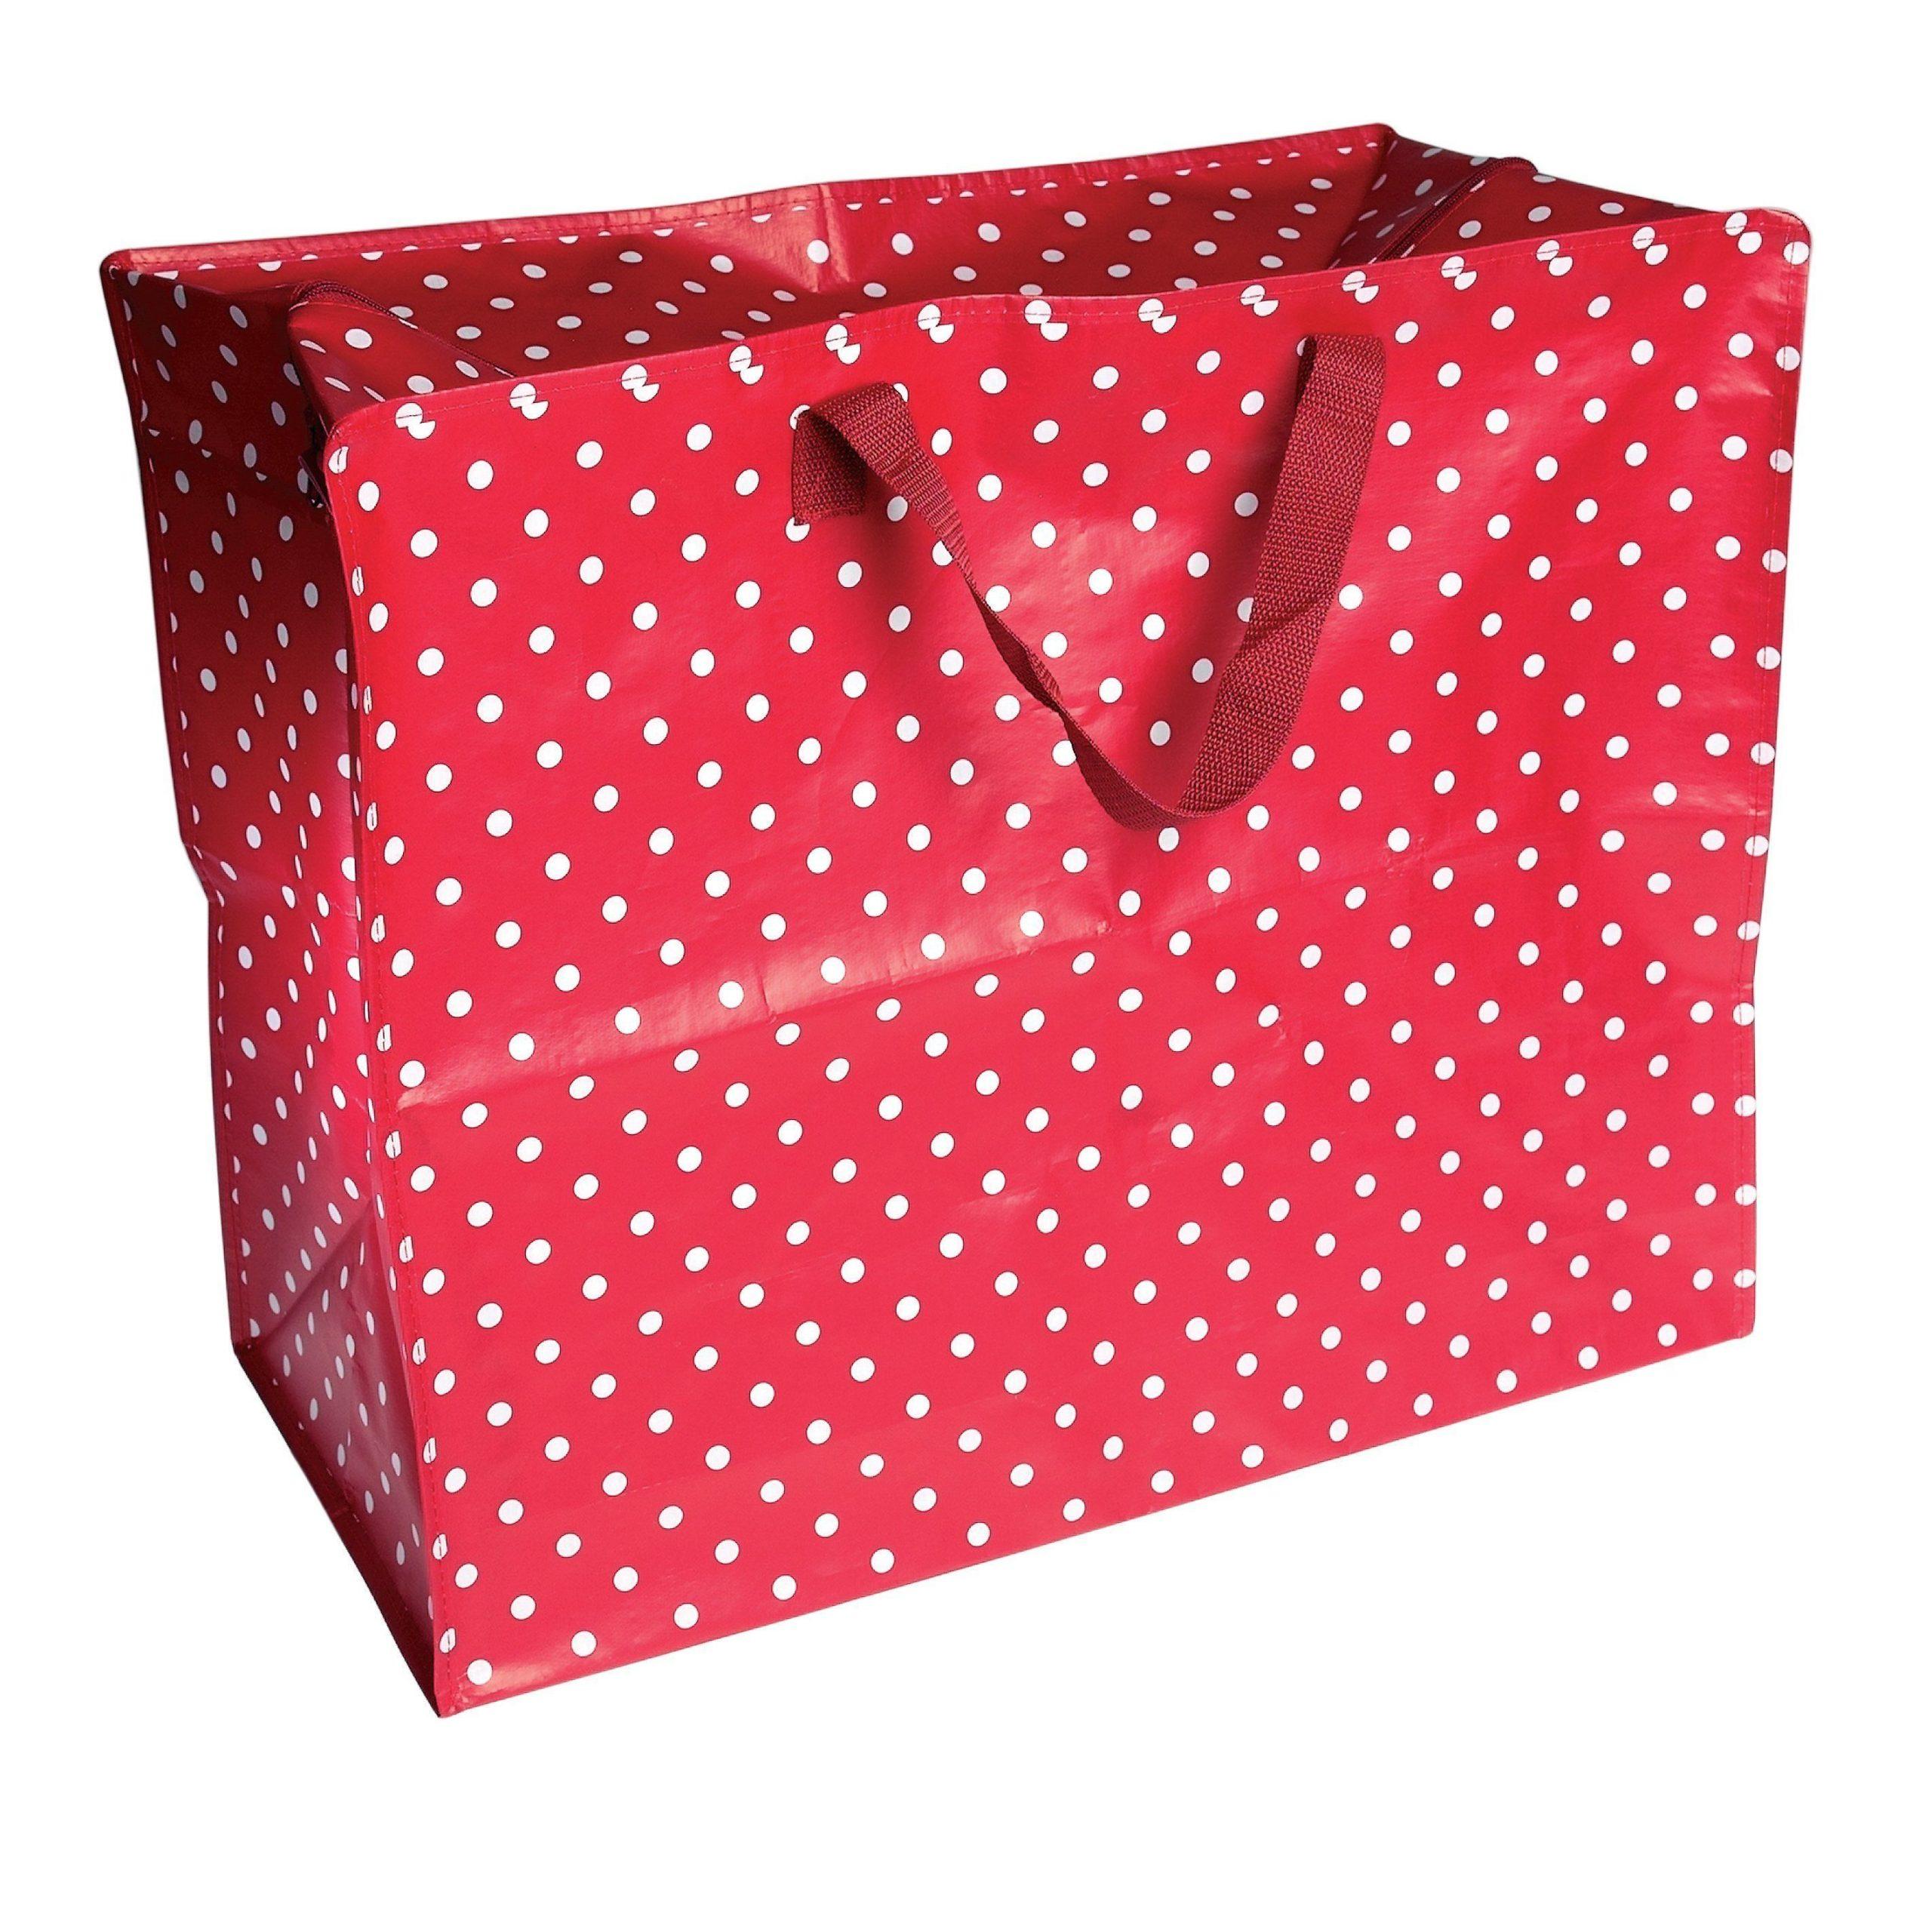 laundry-bags-red-retro-spot-design-jumbo-storage-bag